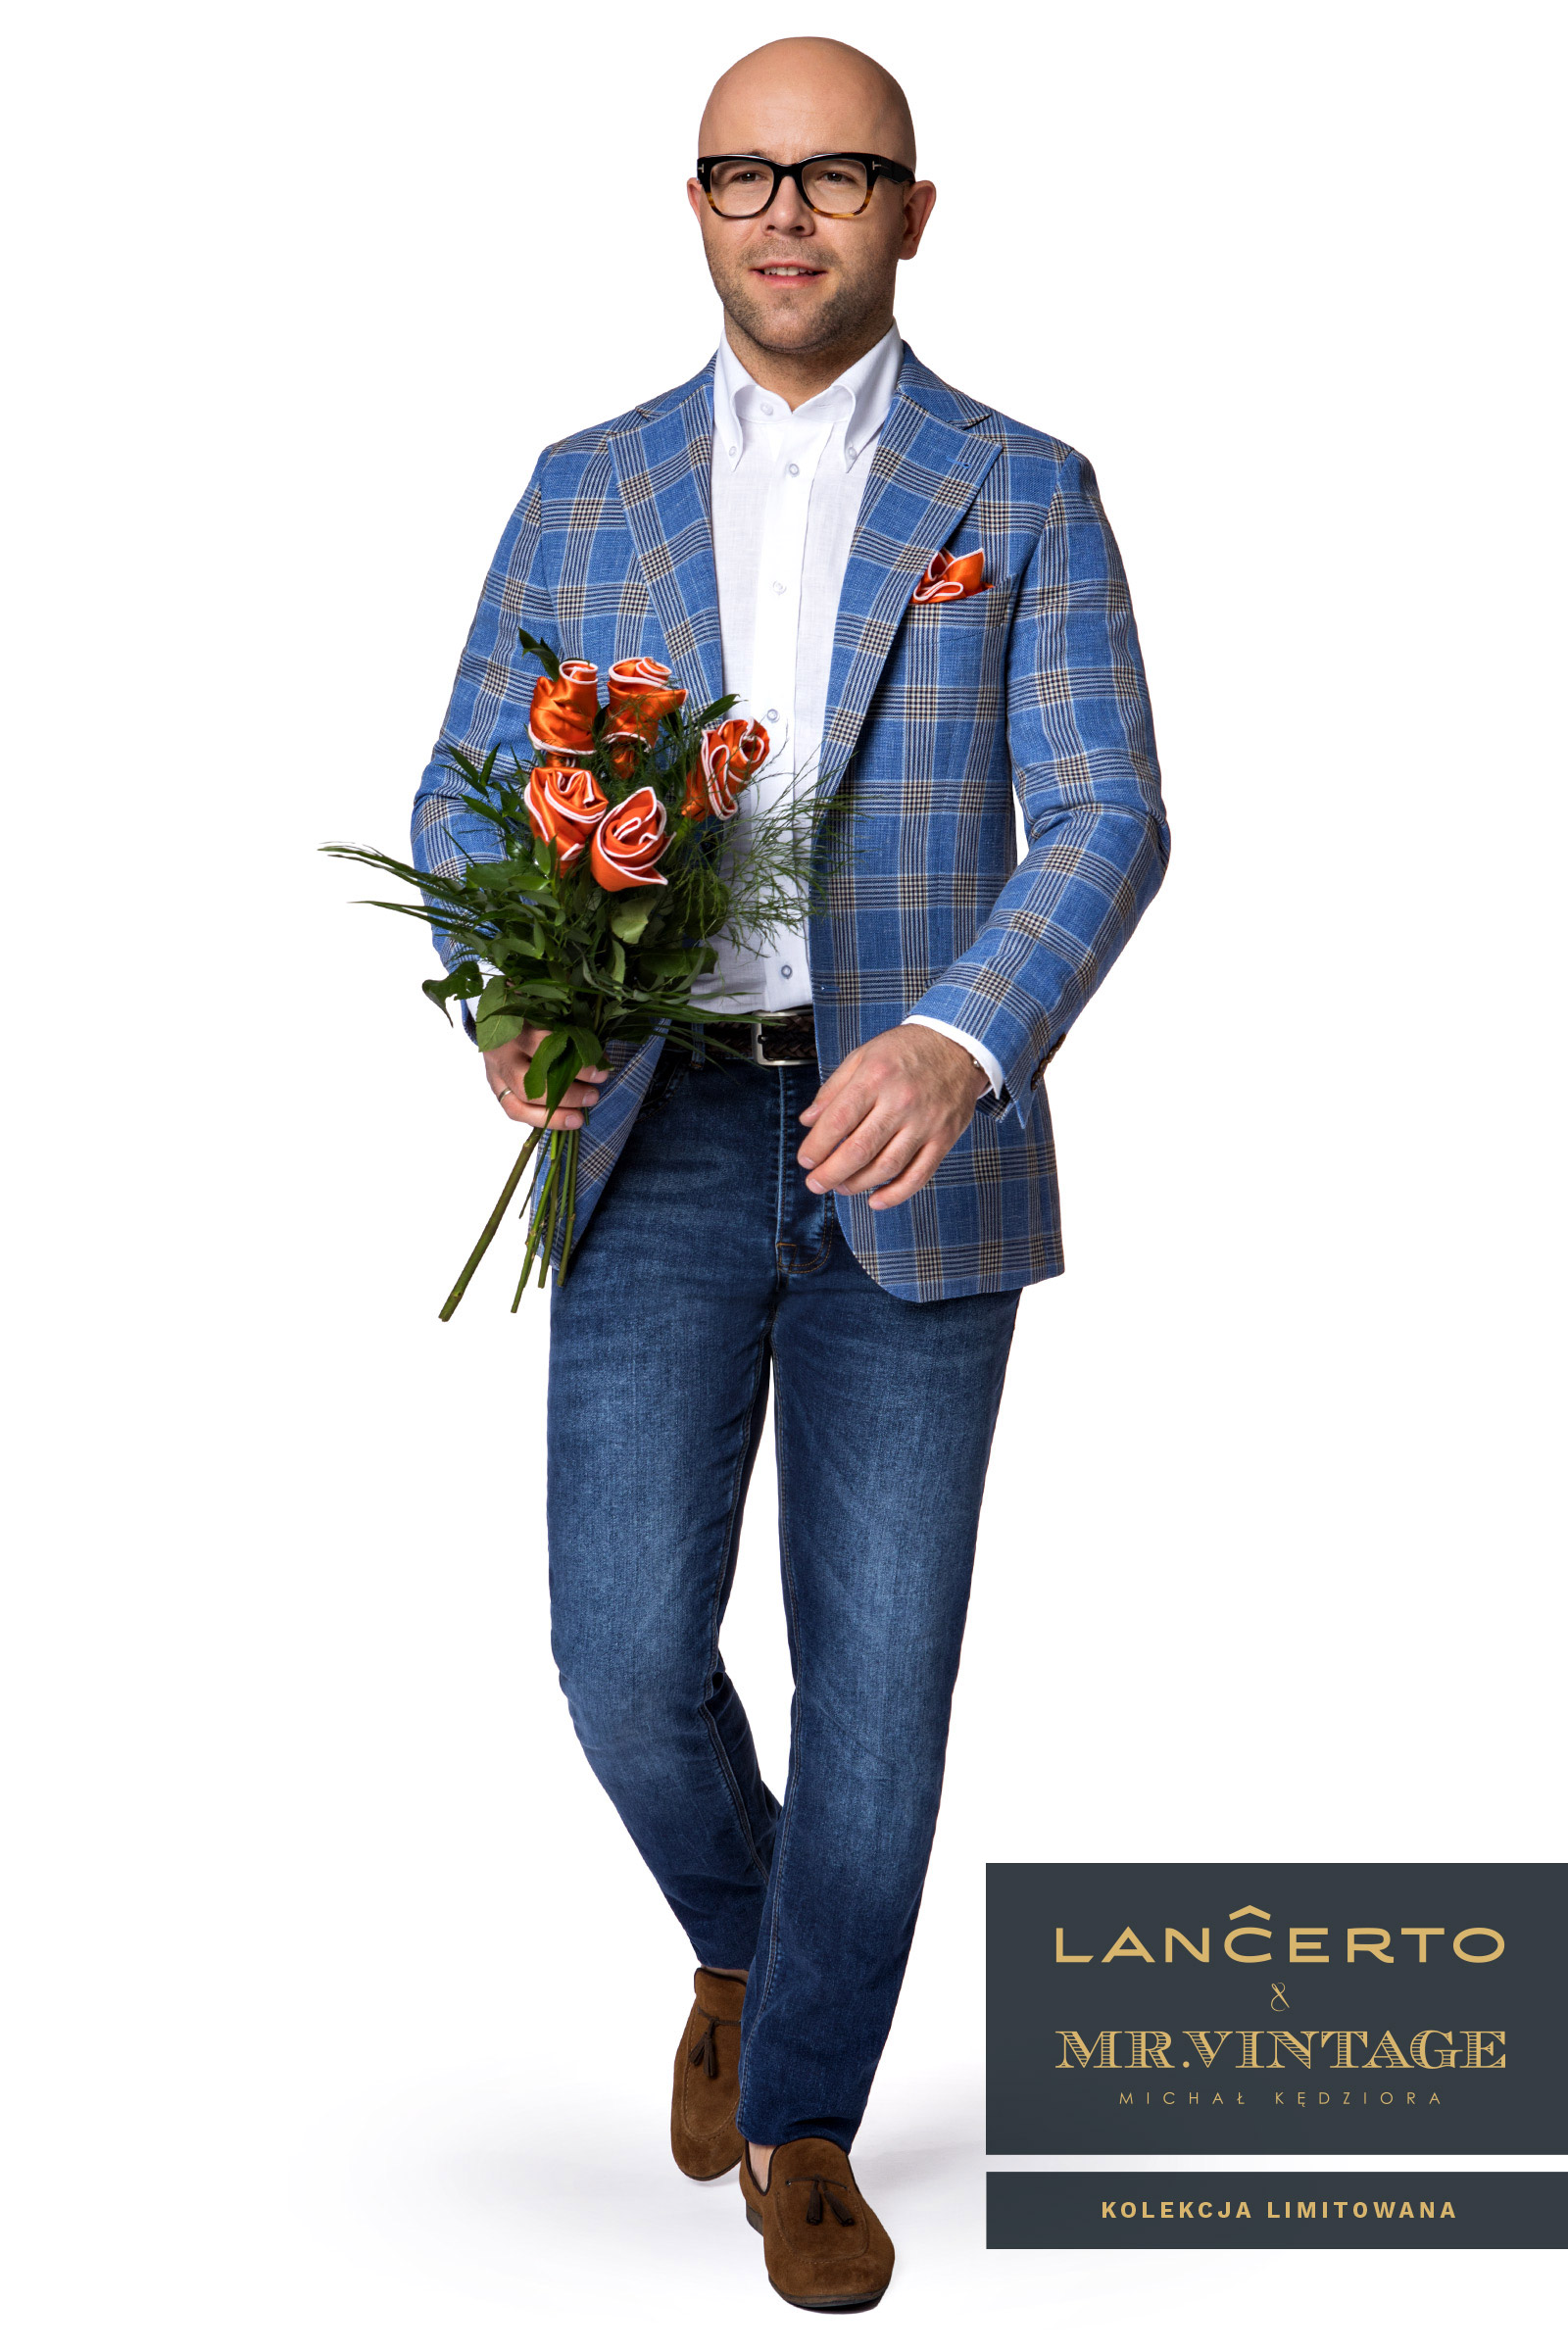 f057e1f93e335 Marynarka Lancerto&Mr.Vintage Mr.Stylish 52 7274476109 - Allegro.pl